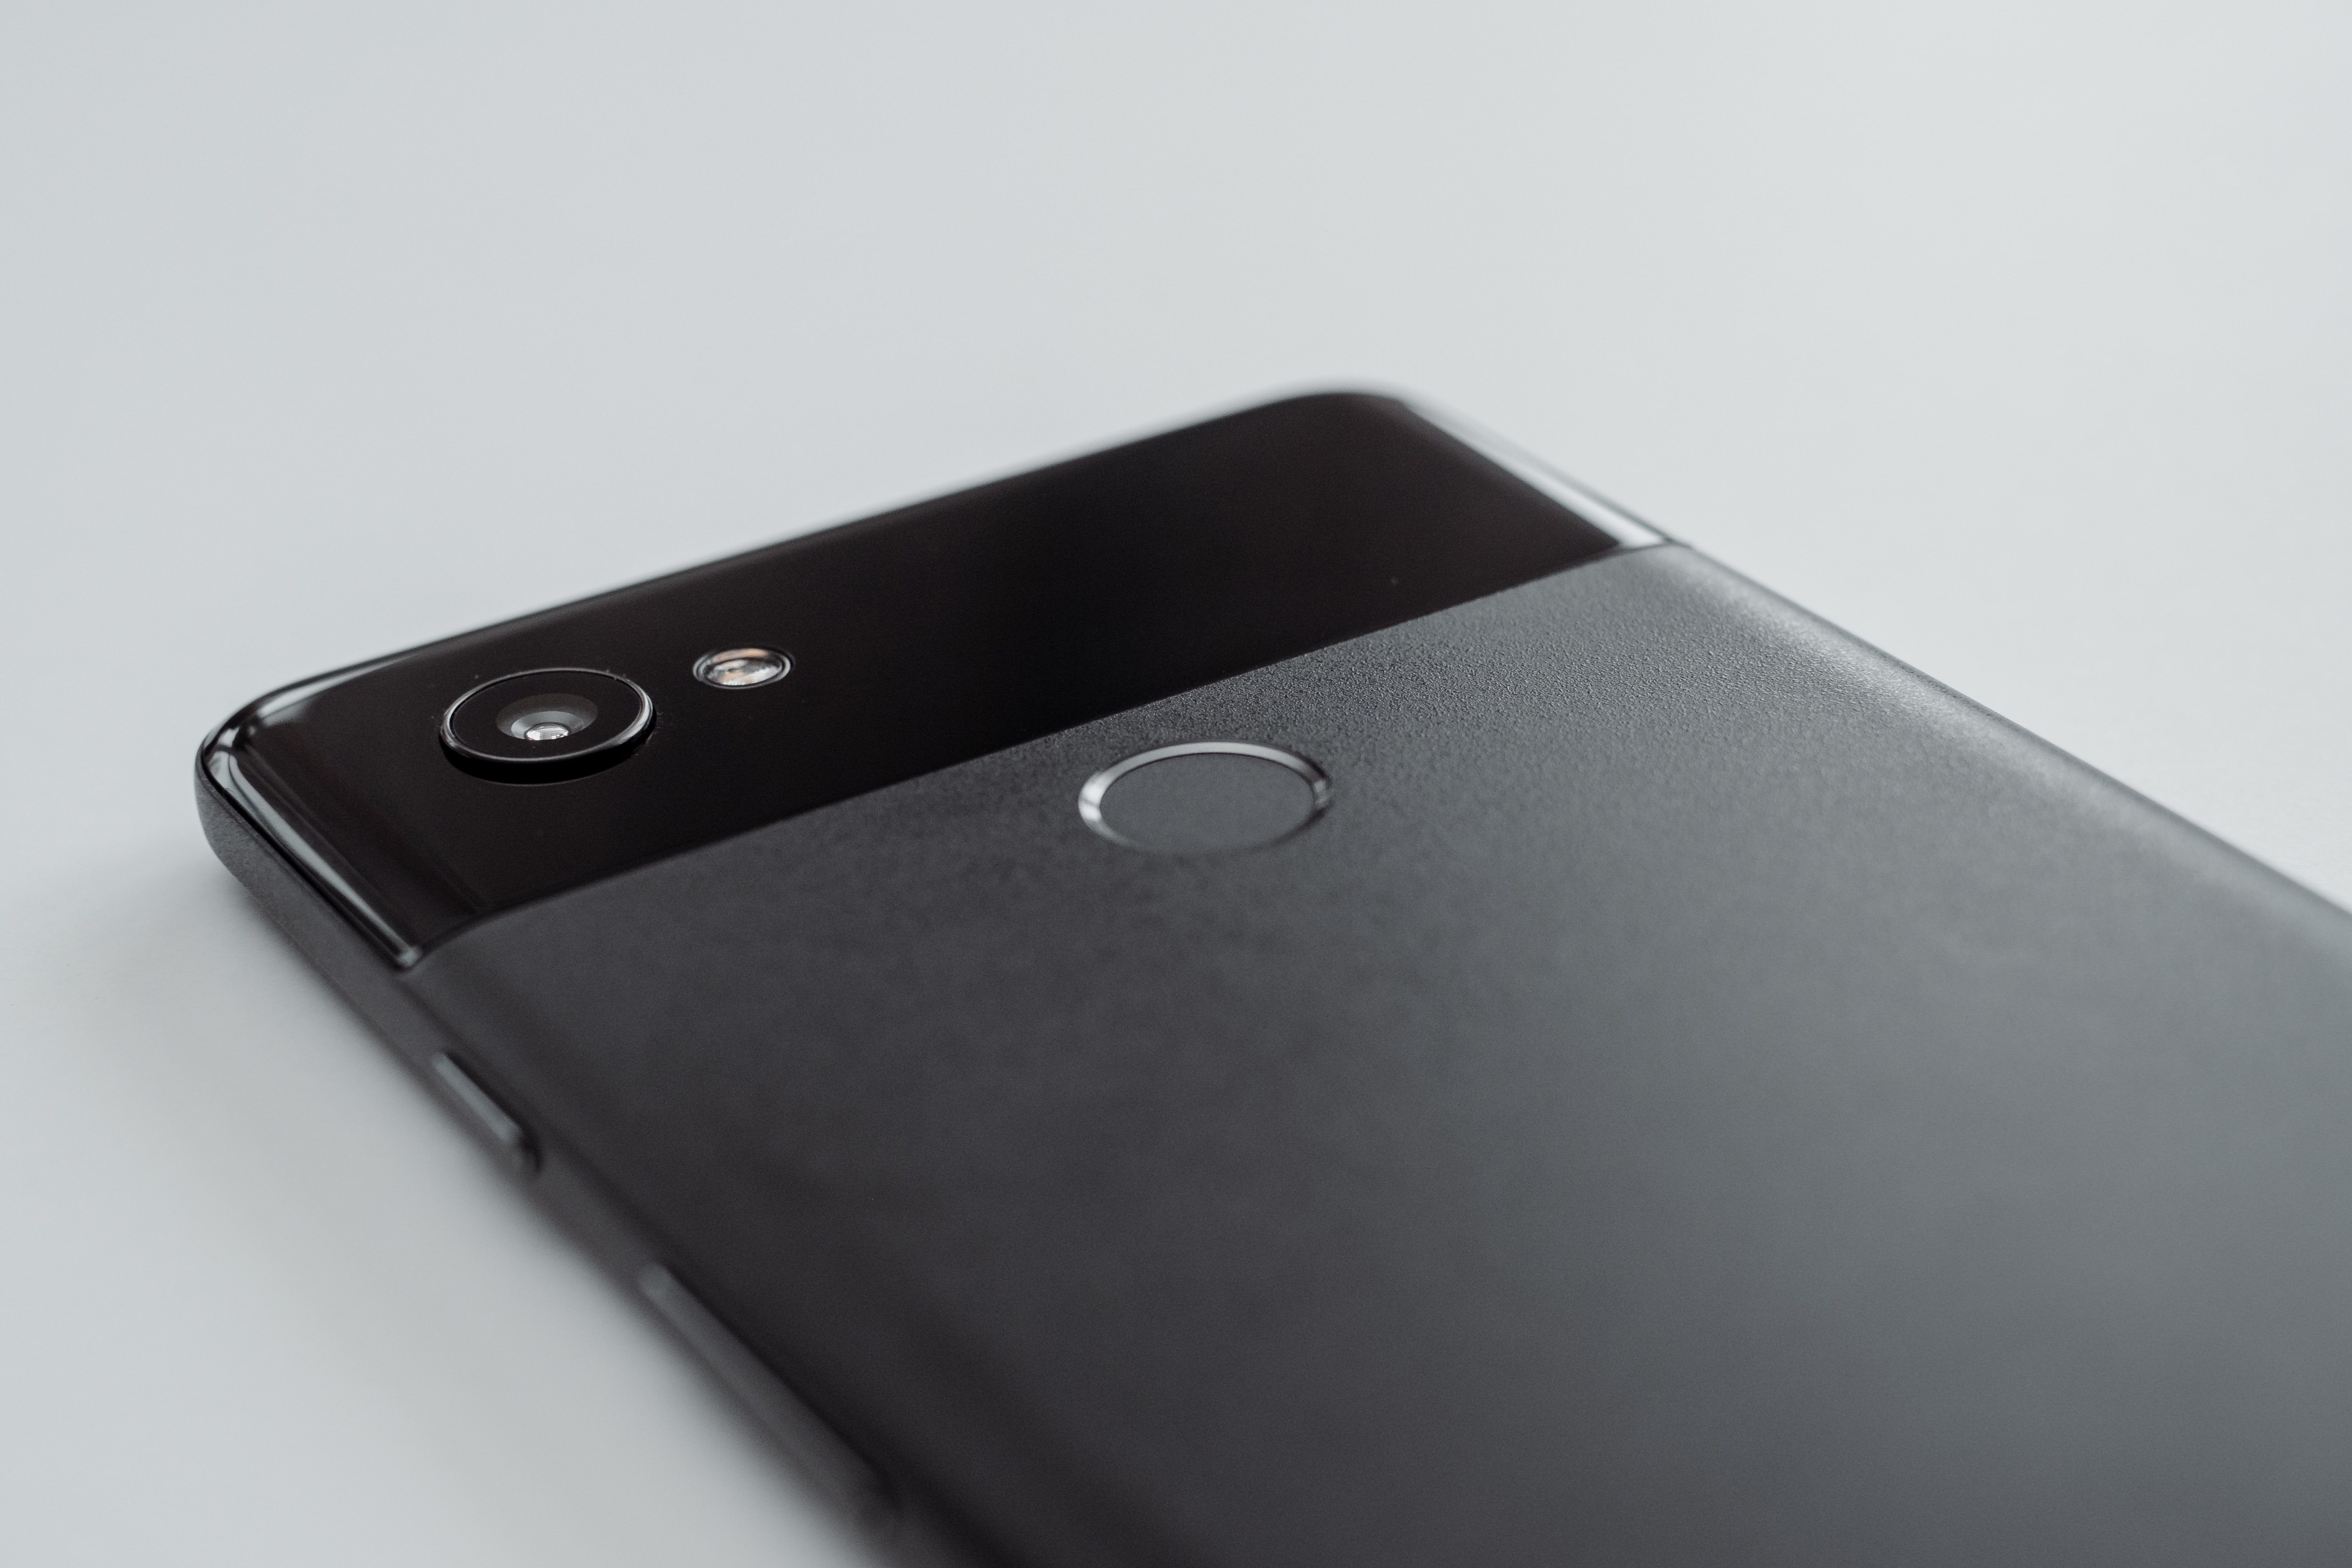 Google Pixel 4に向けた準備だとすると「顔認証」機能の検証?